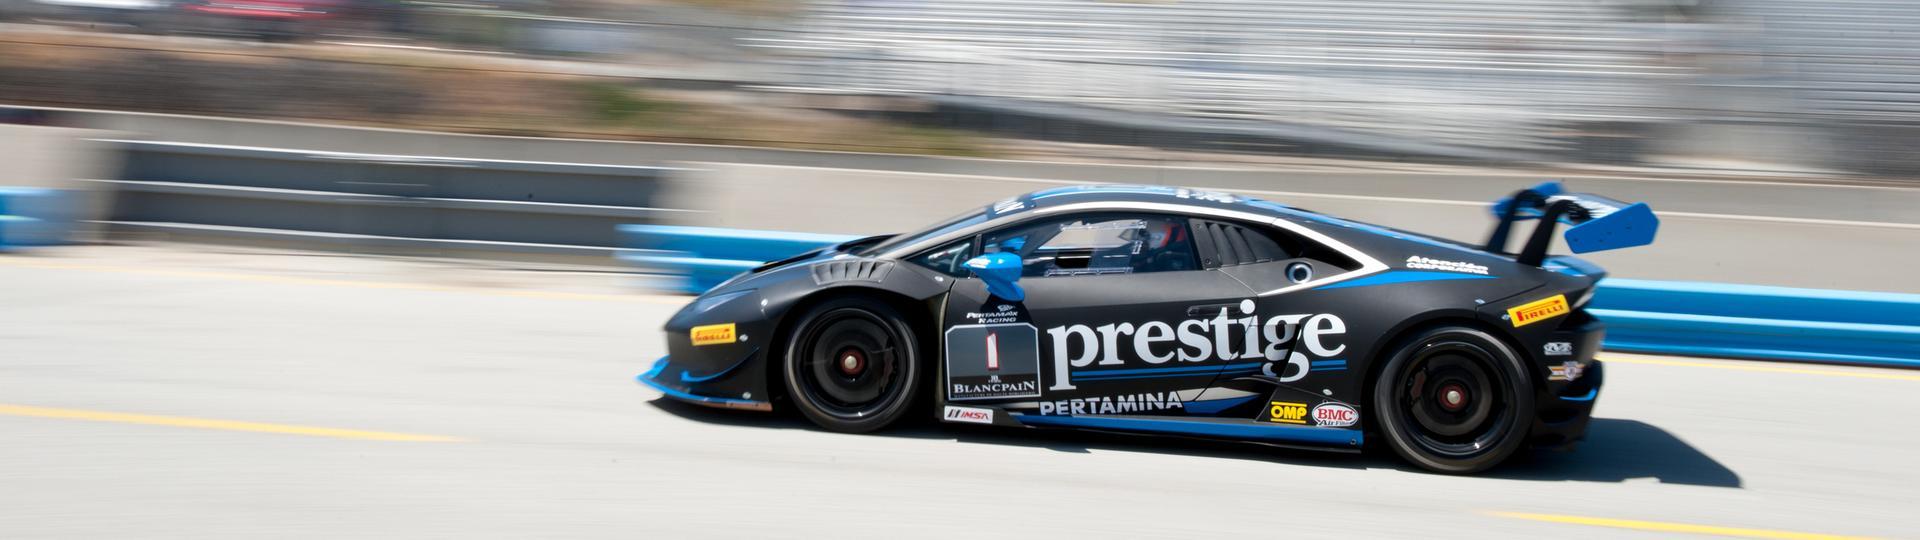 Lamborghini Super Trofeo North America 2017: VIR